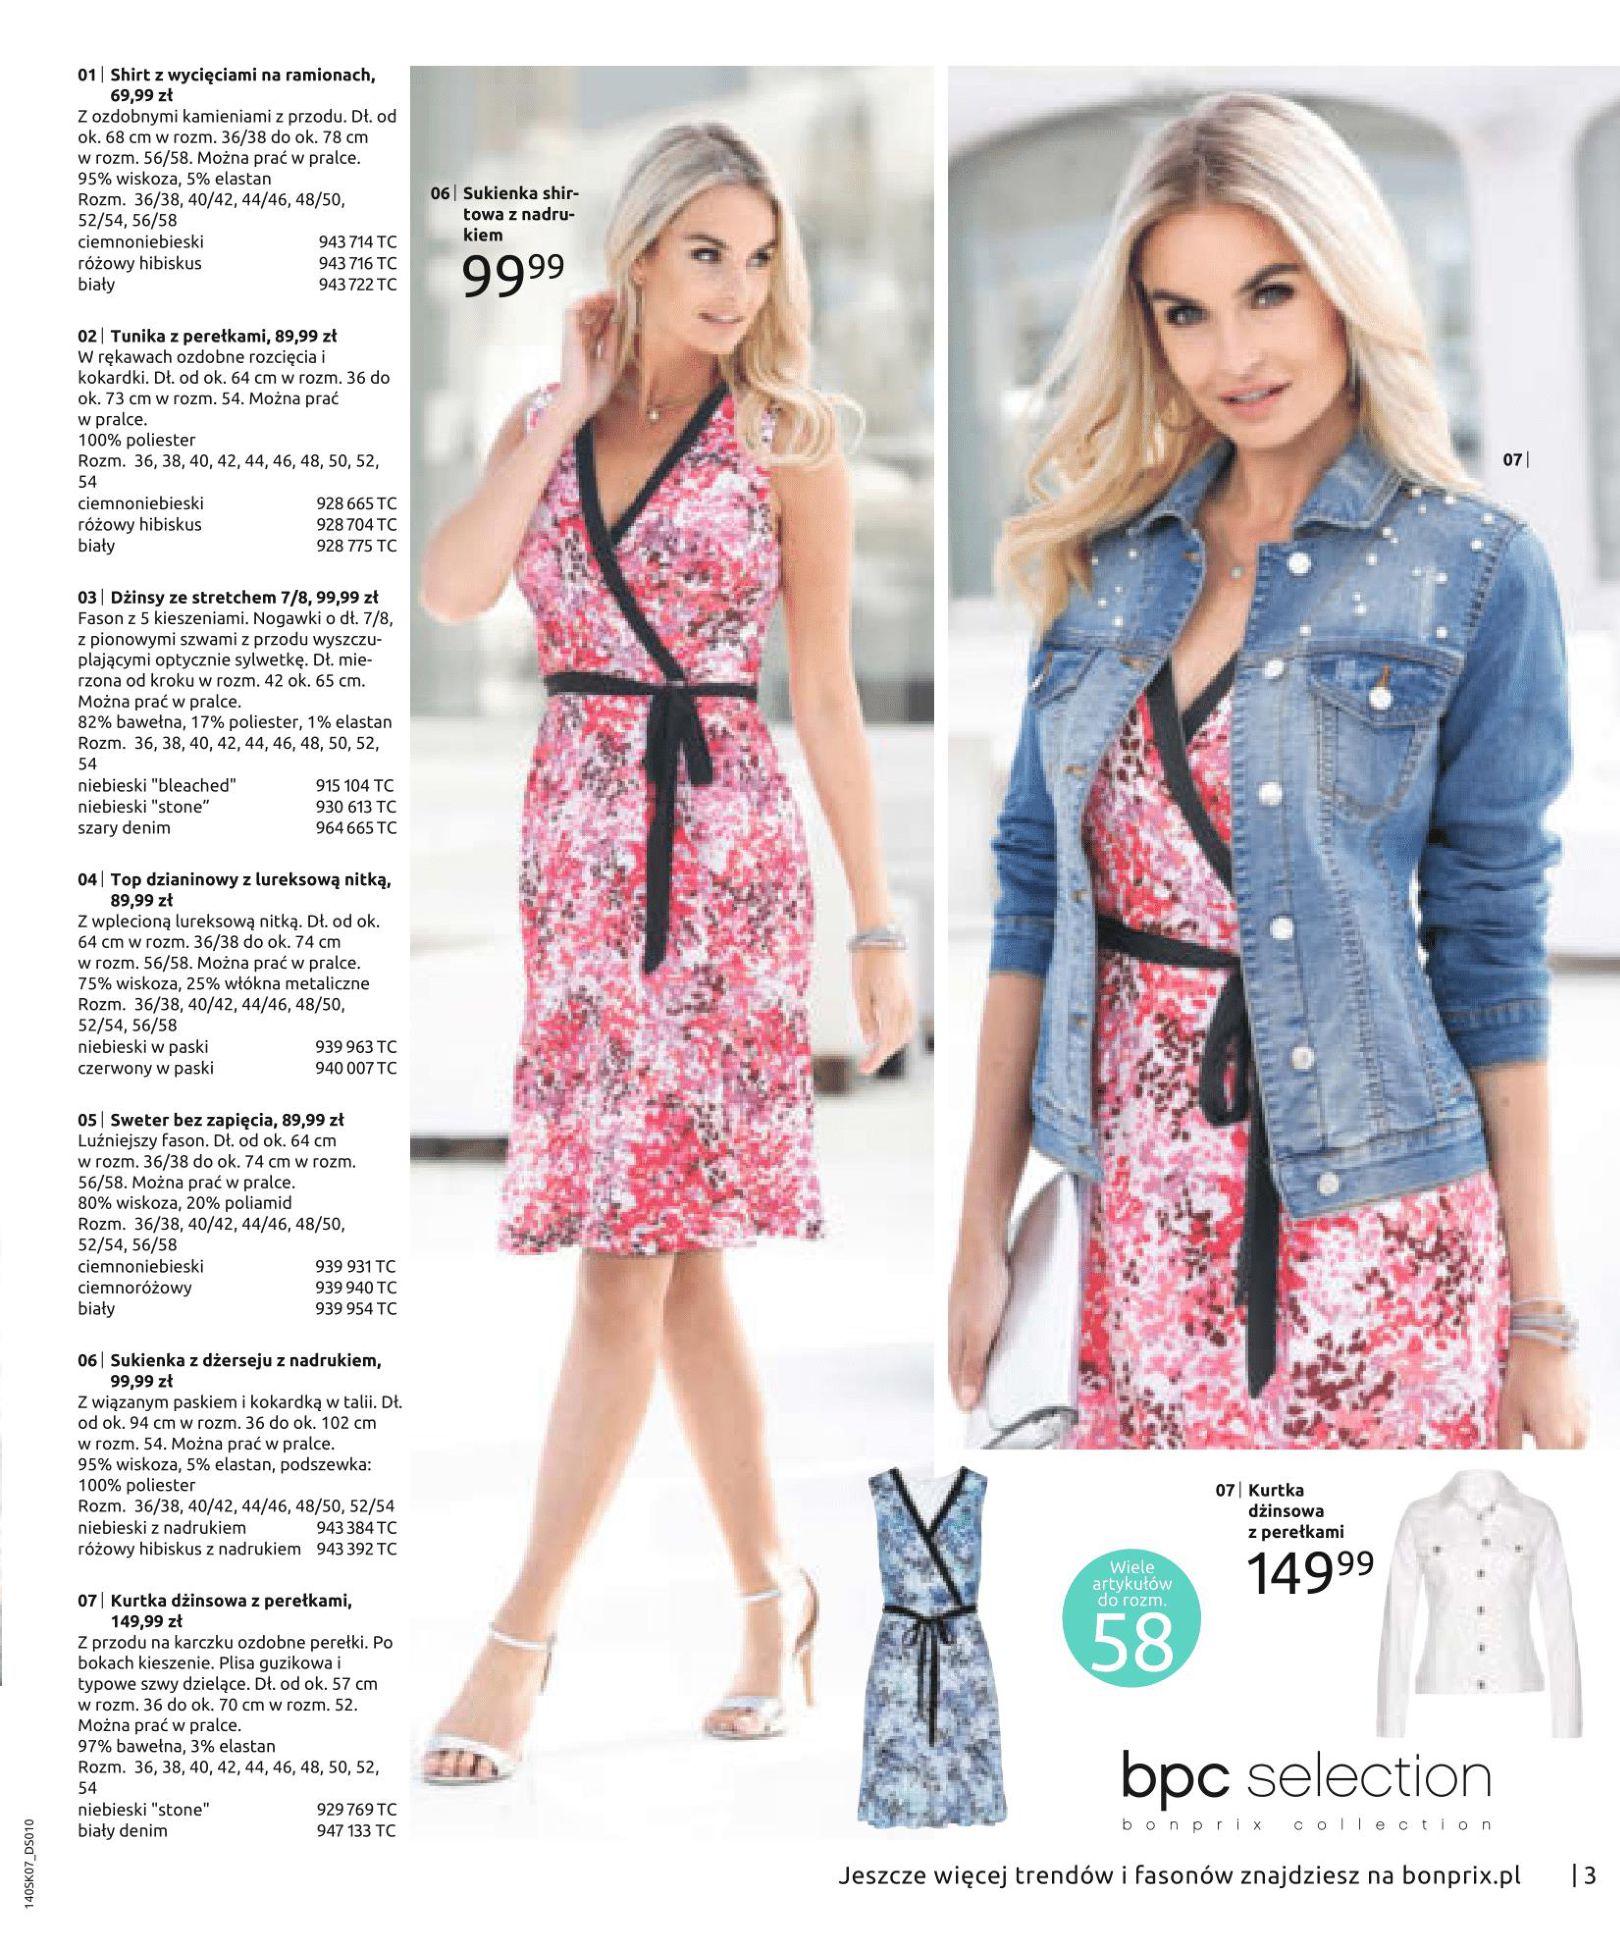 Gazetka Bonprix - Letnie trendy-02.07.2019-15.01.2020-page-5